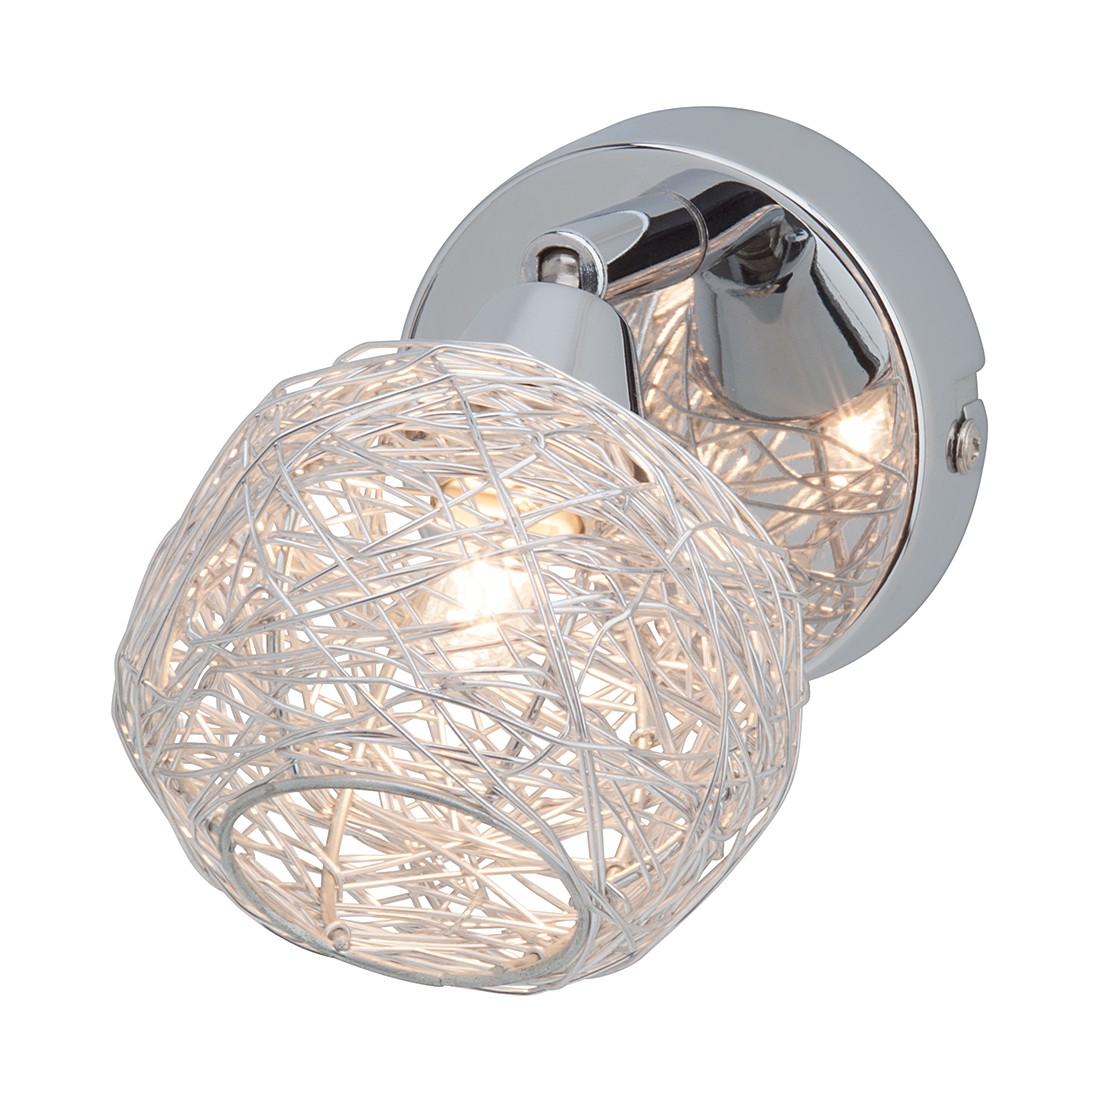 EEK A++, Wandleuchte Sally- Aluminium/Metall/Aluminium – Weiß – 1-flammig, Brilliant jetzt kaufen